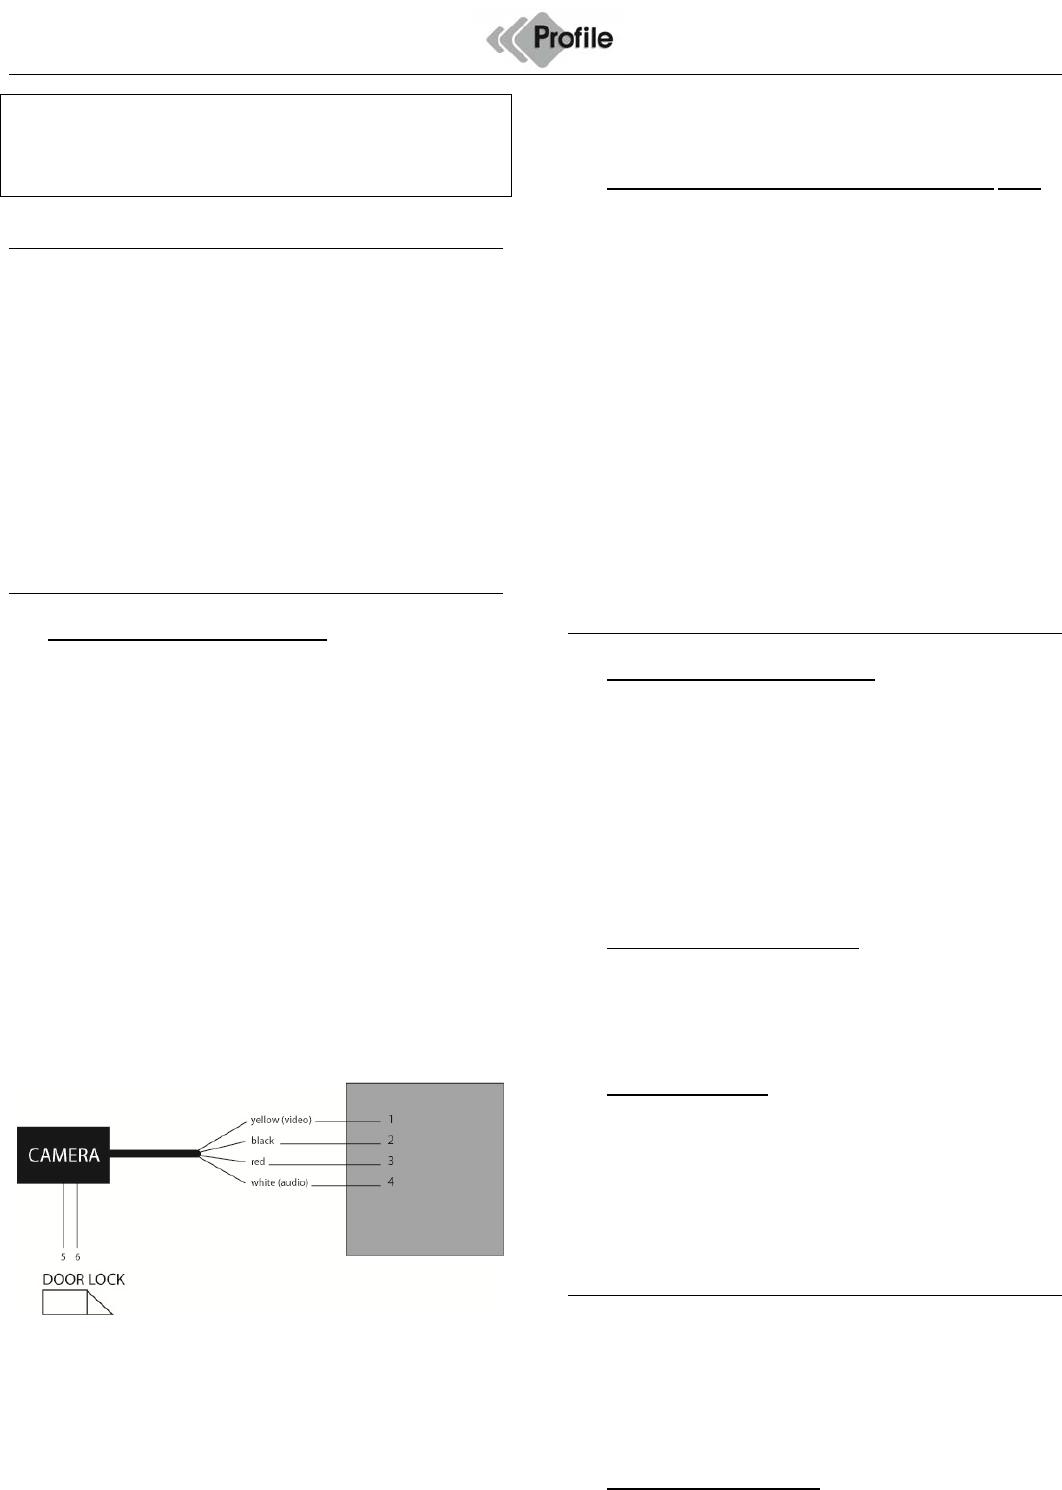 Handleiding Profile PAC-114 Design multi Videophone (pagina 3 van 20 ...